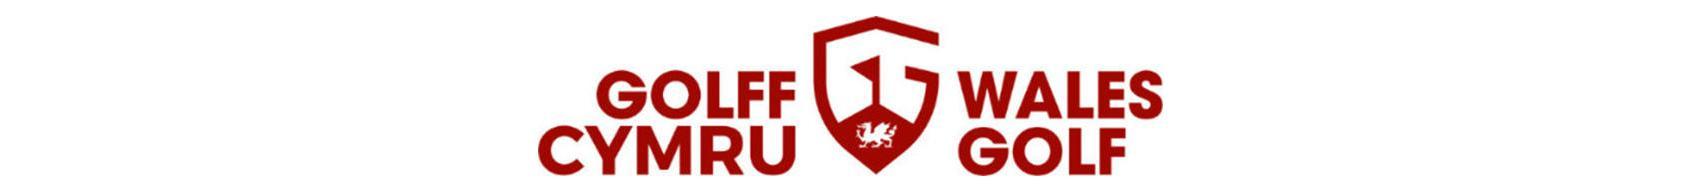 Golf Wales bilingual modlogo